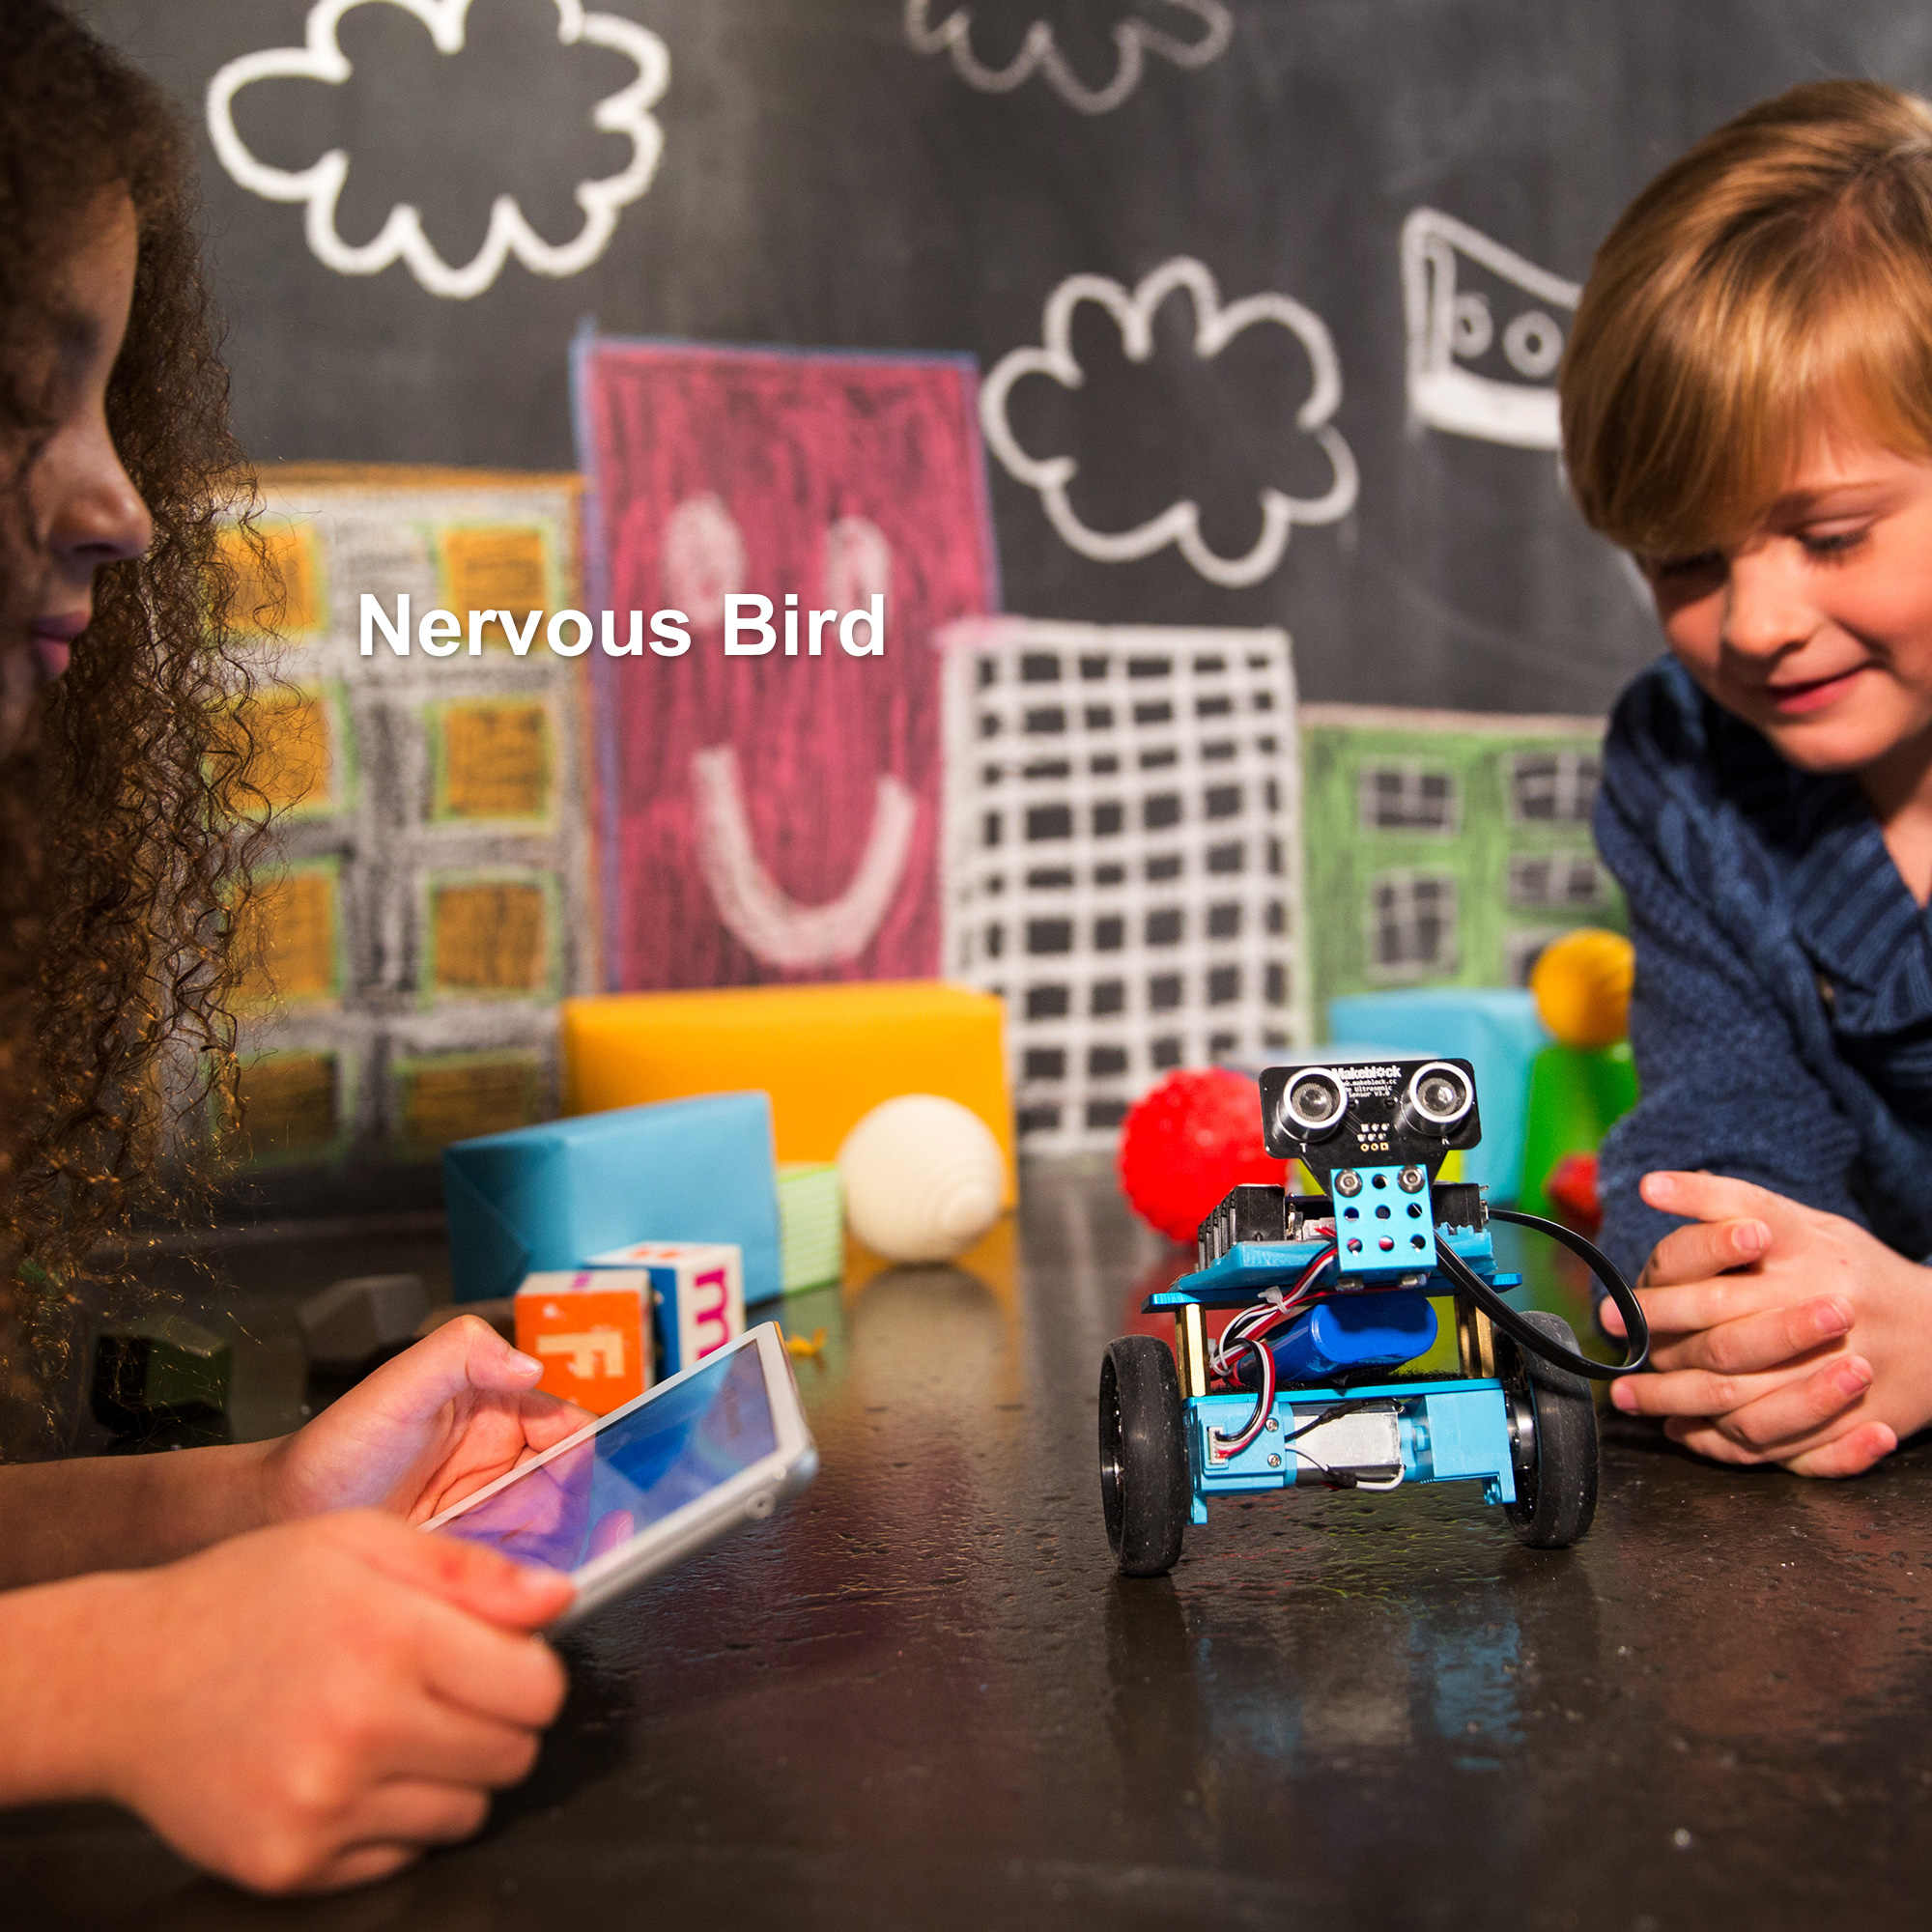 Makeblock לתכנות mBot ריינג 'ר רובוט ערכת, Arduino, גזע חינוך, 3 ב 1 לתכנות רובוטית לילדים, גיל 12 +